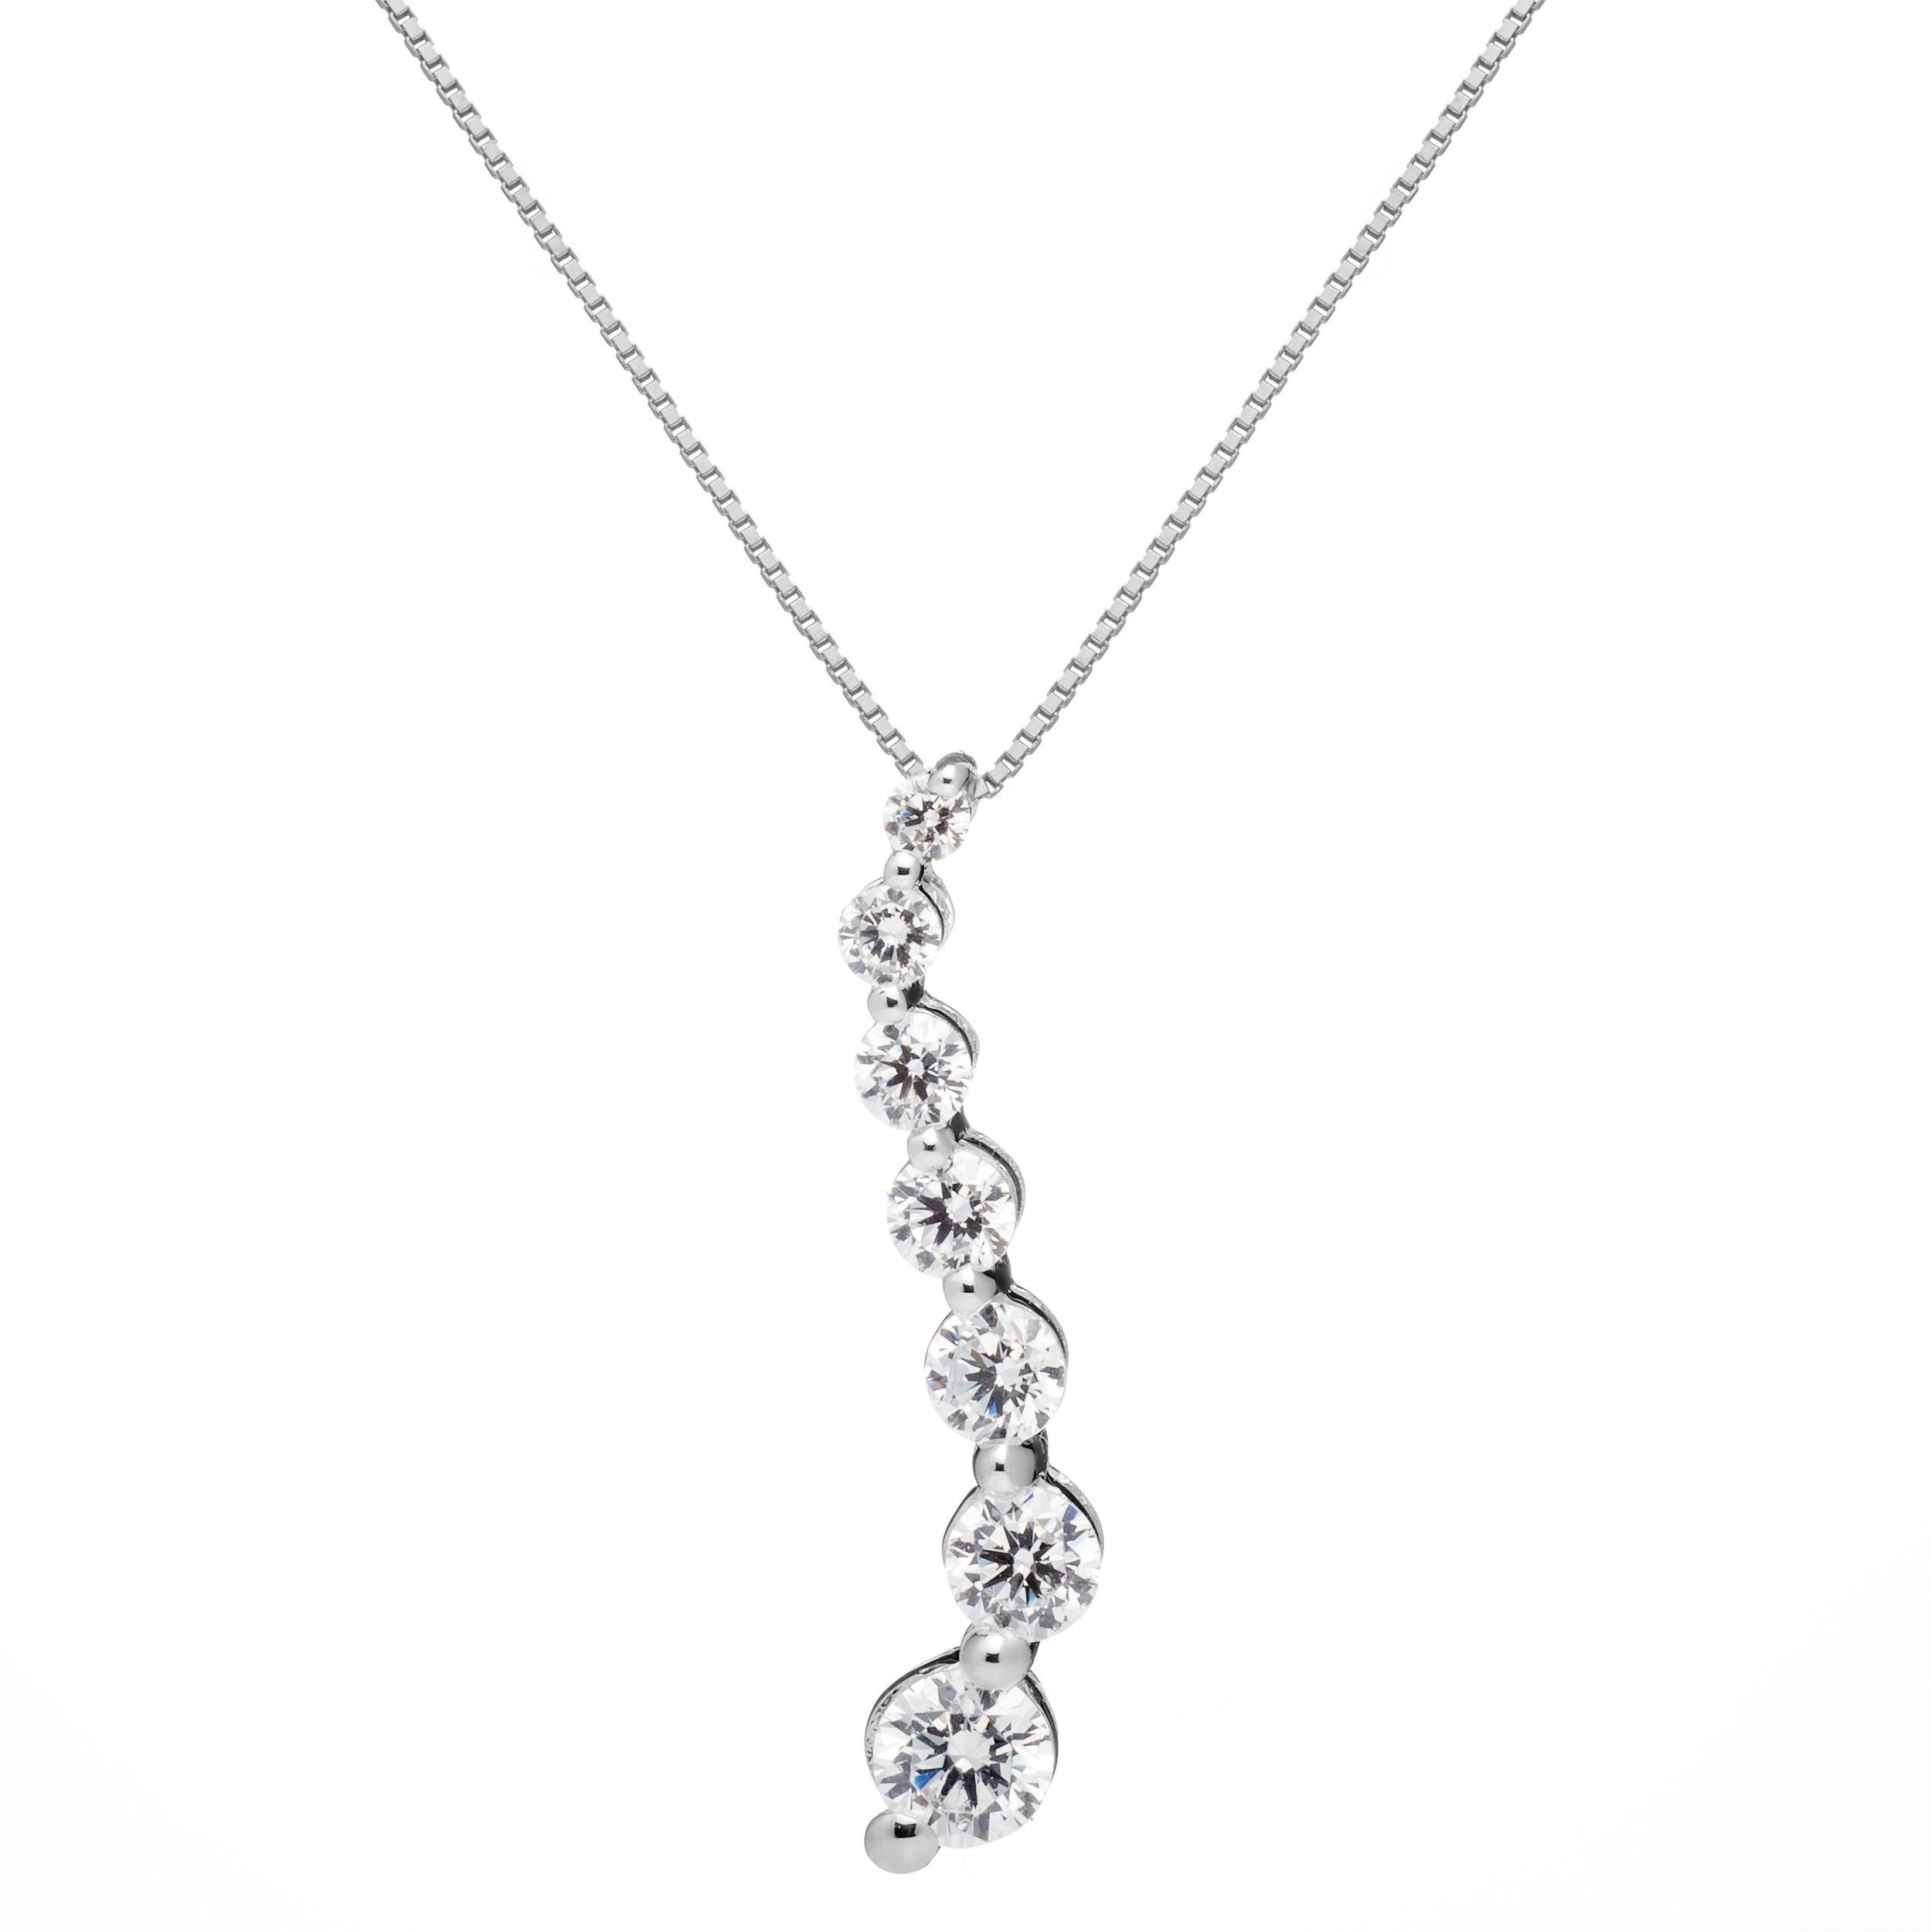 K solid white gold round cut cz journey stone pendant necklace